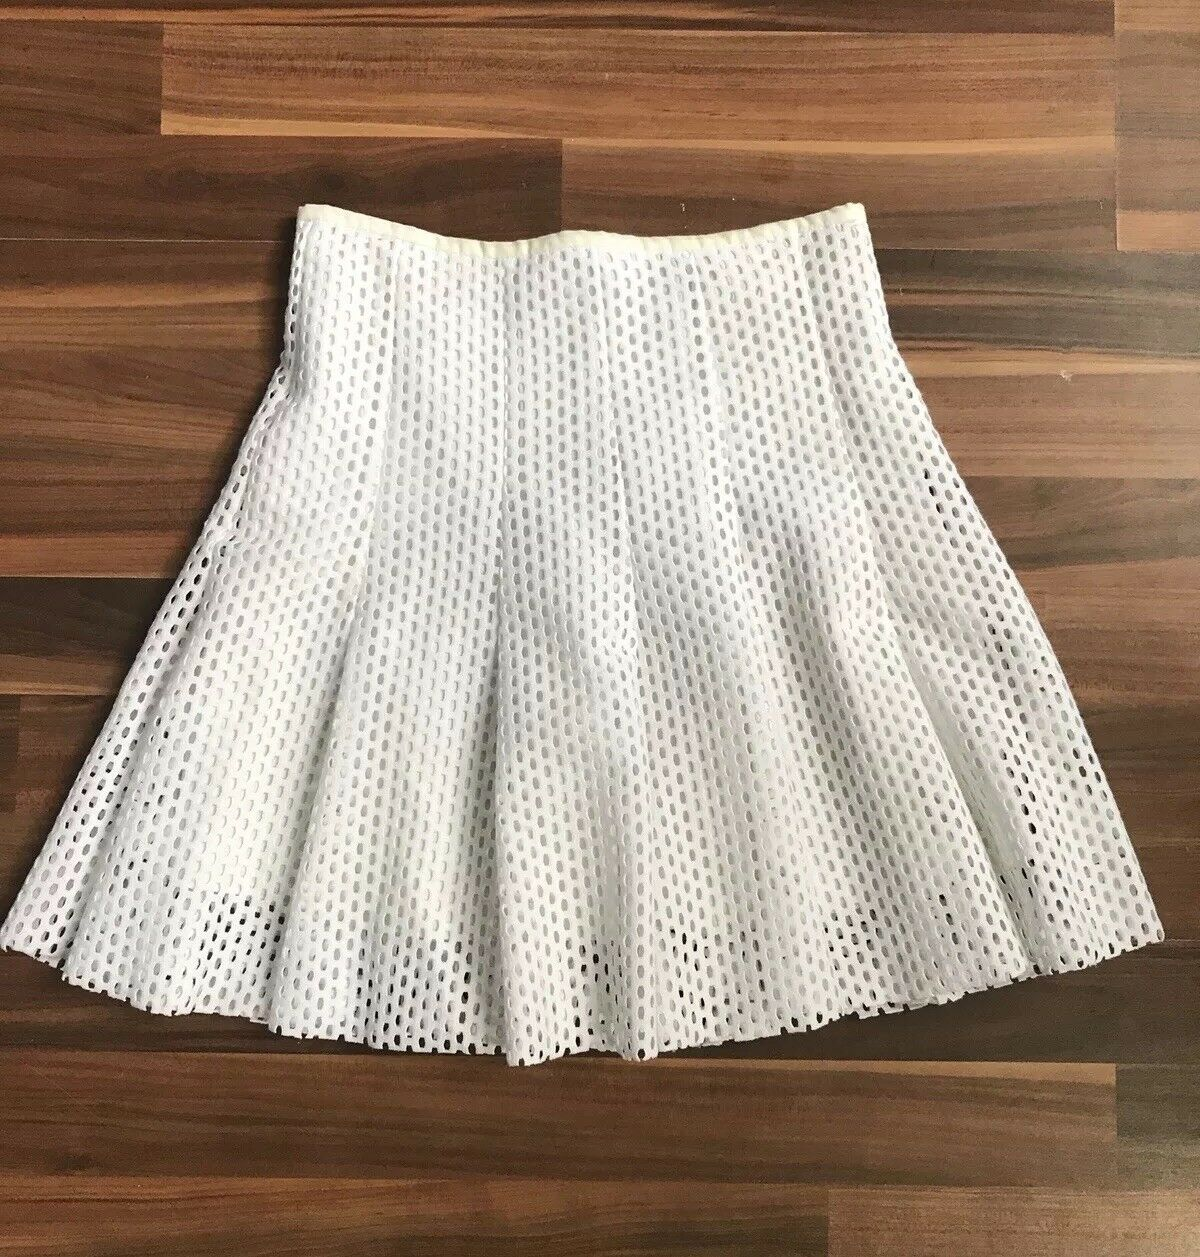 Sandro Paris Mesh Skirt Sz 1 White Perforated